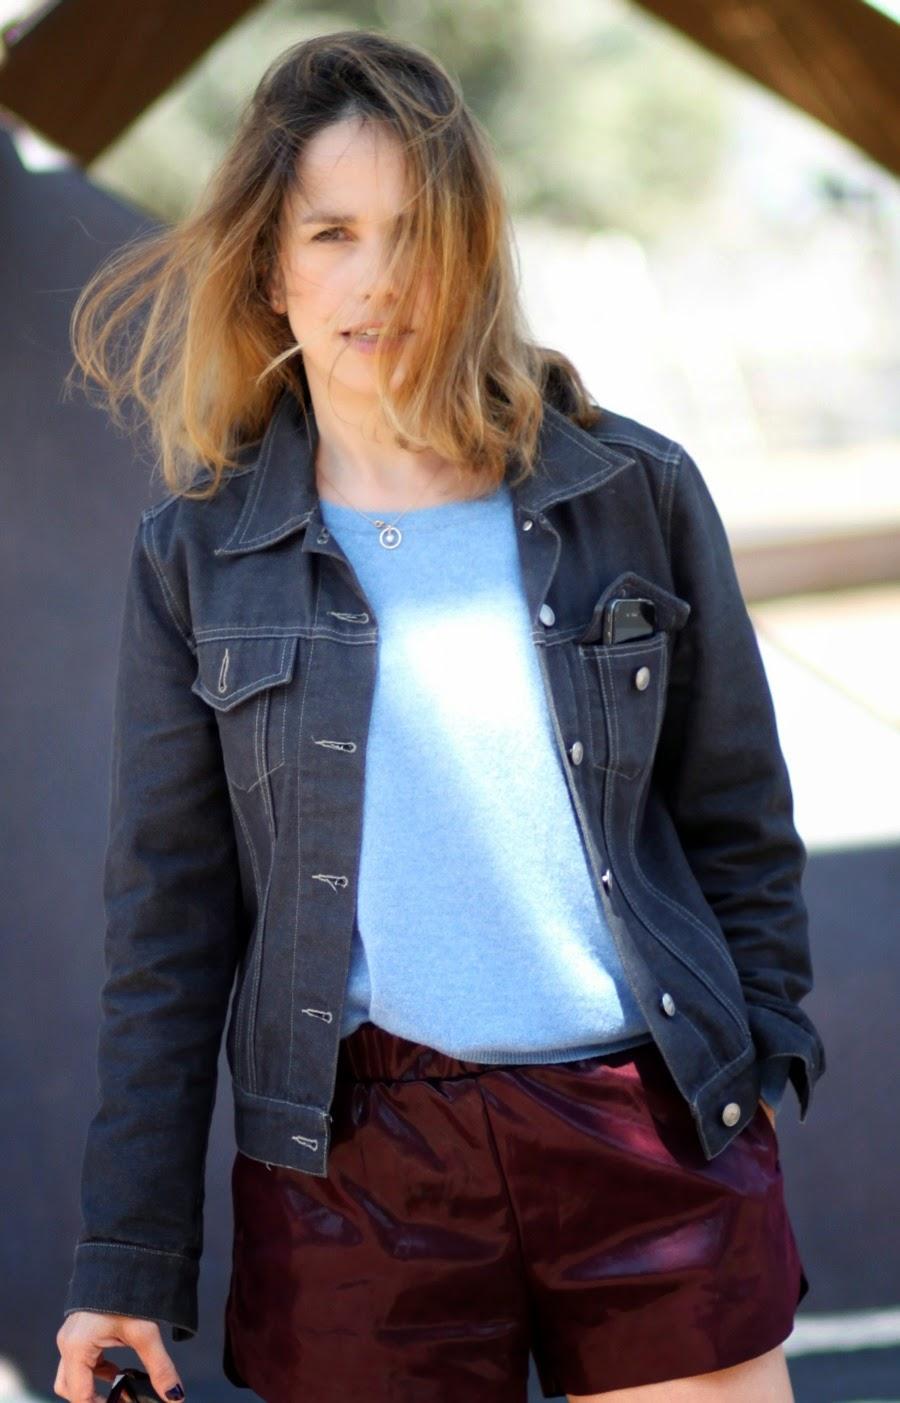 givenchy, ss15, wardrobe, ootd, lookoftheday, fashionblog, streetstyle, אופנה, בלוגאופנה, סטייל,